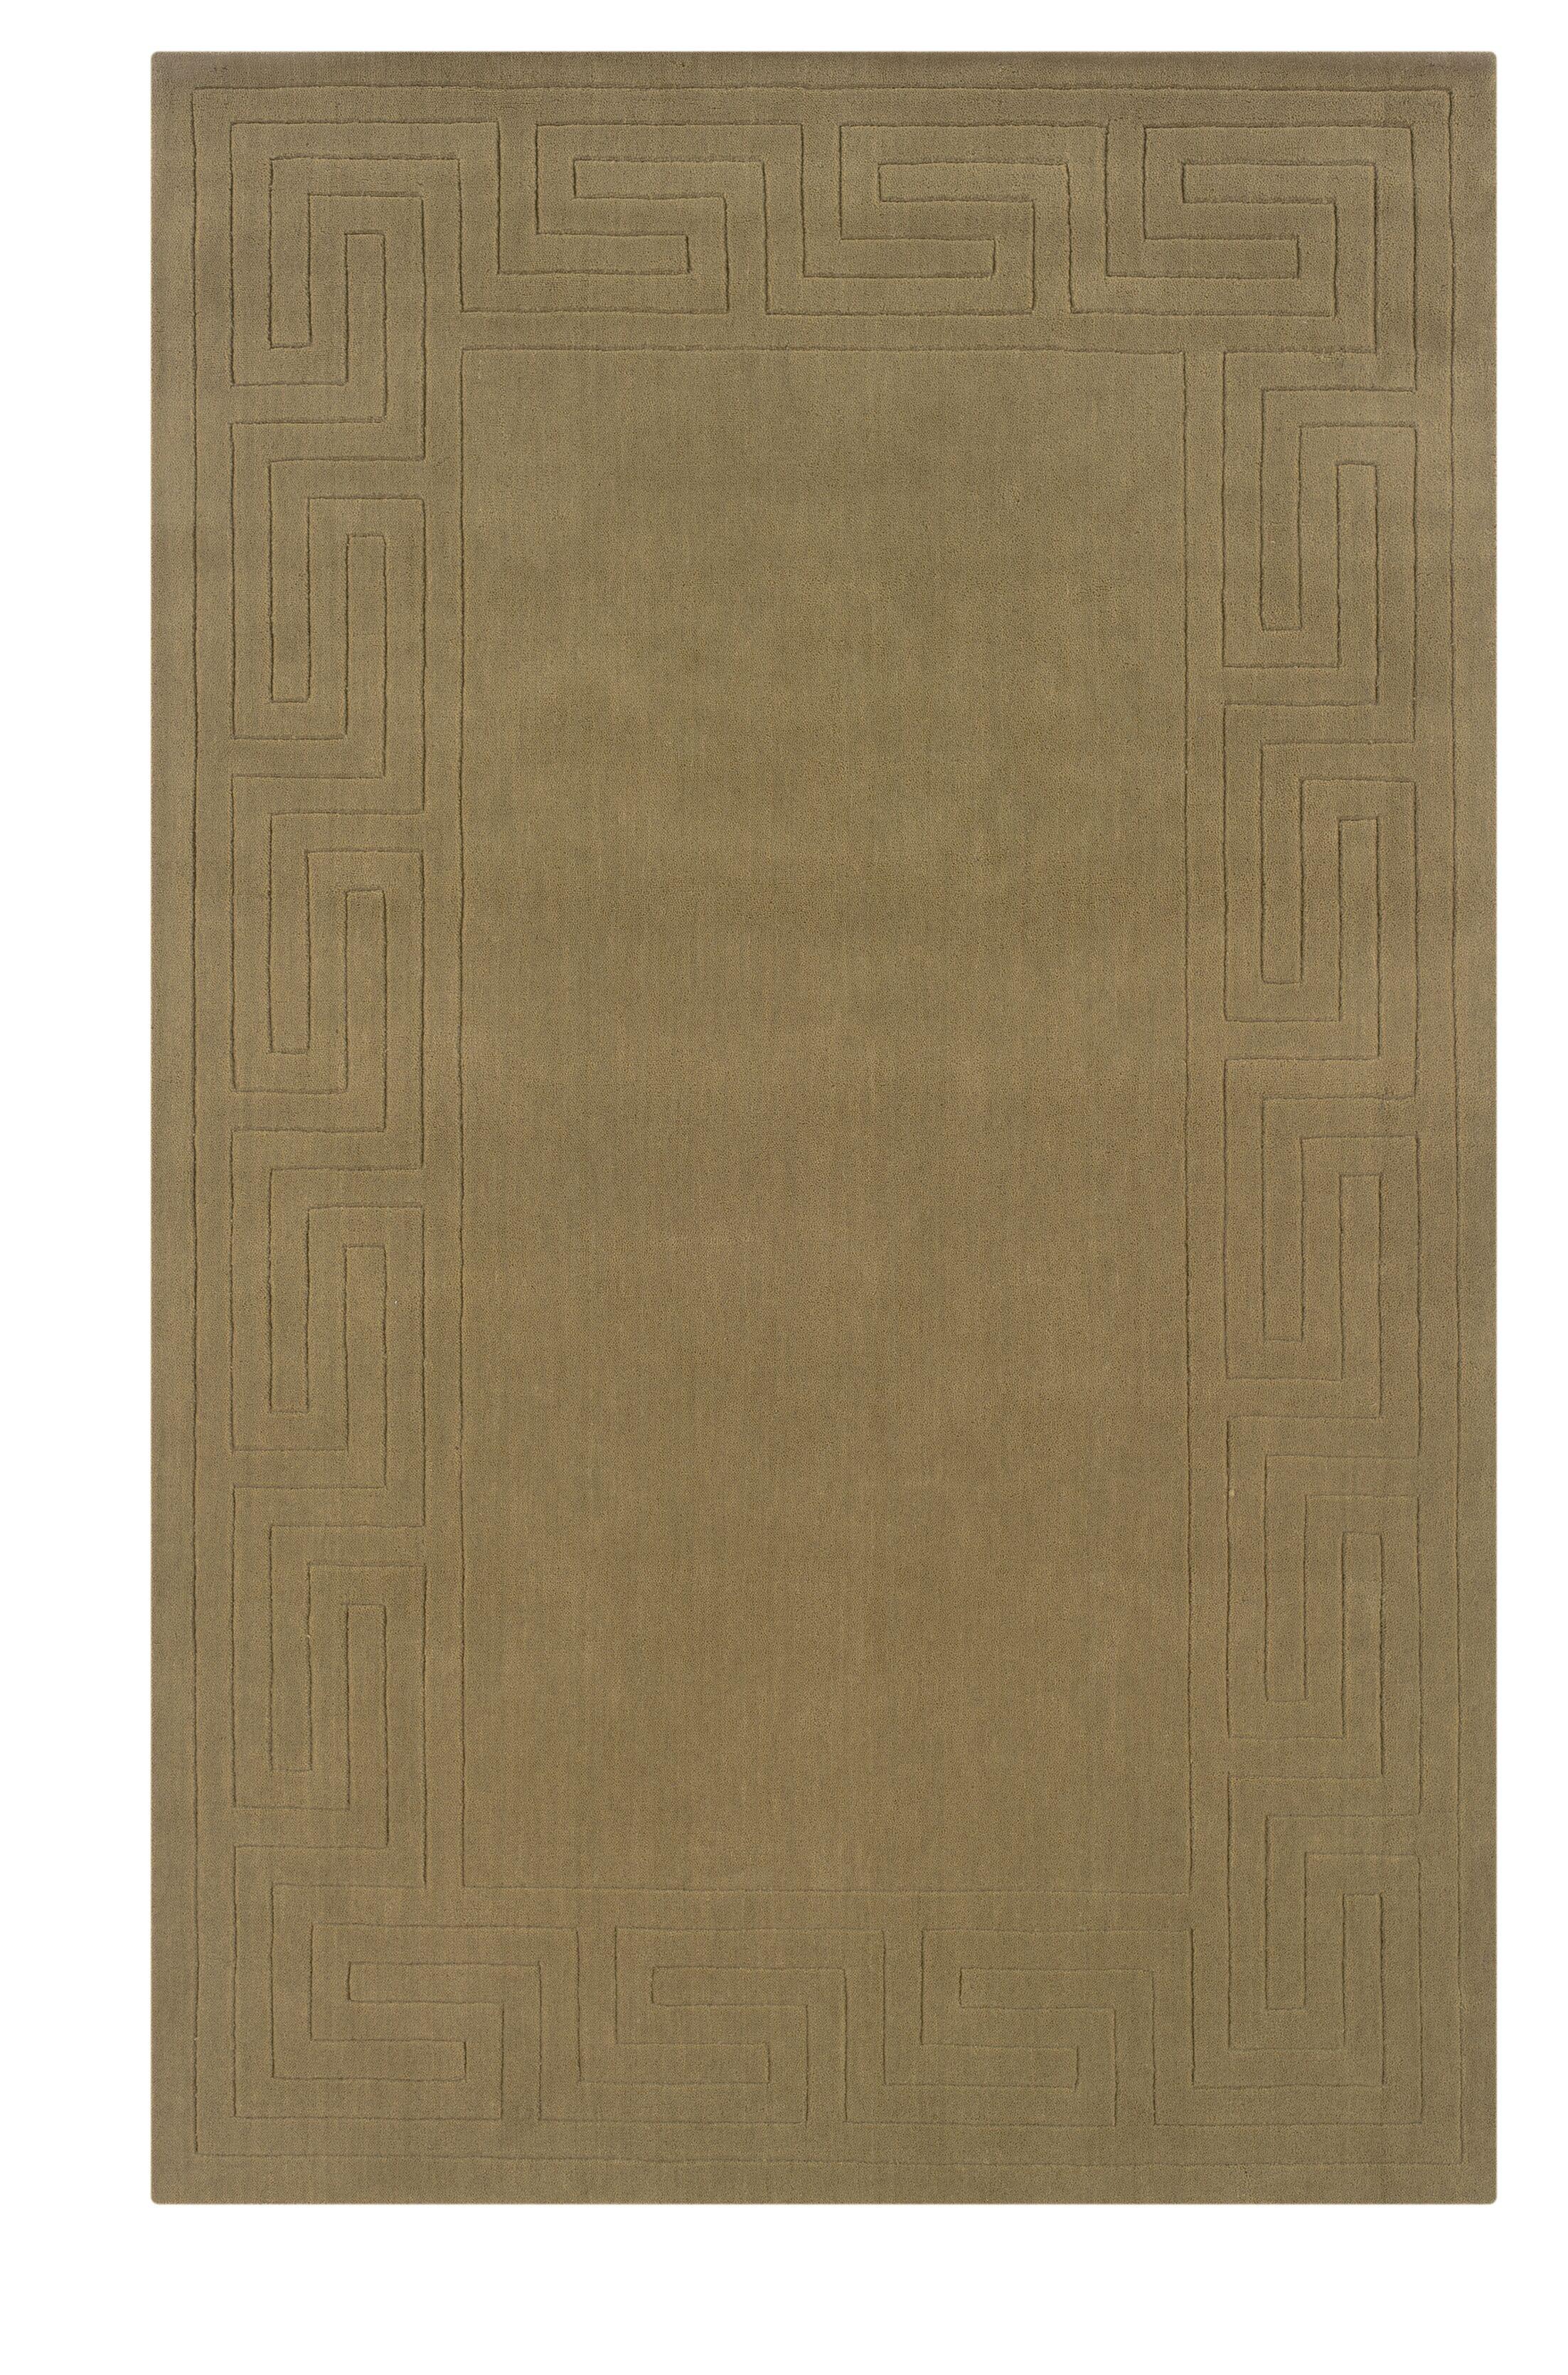 Hand-Woven Beige Area Rug Rug Size: Rectangle 8' x 10'1